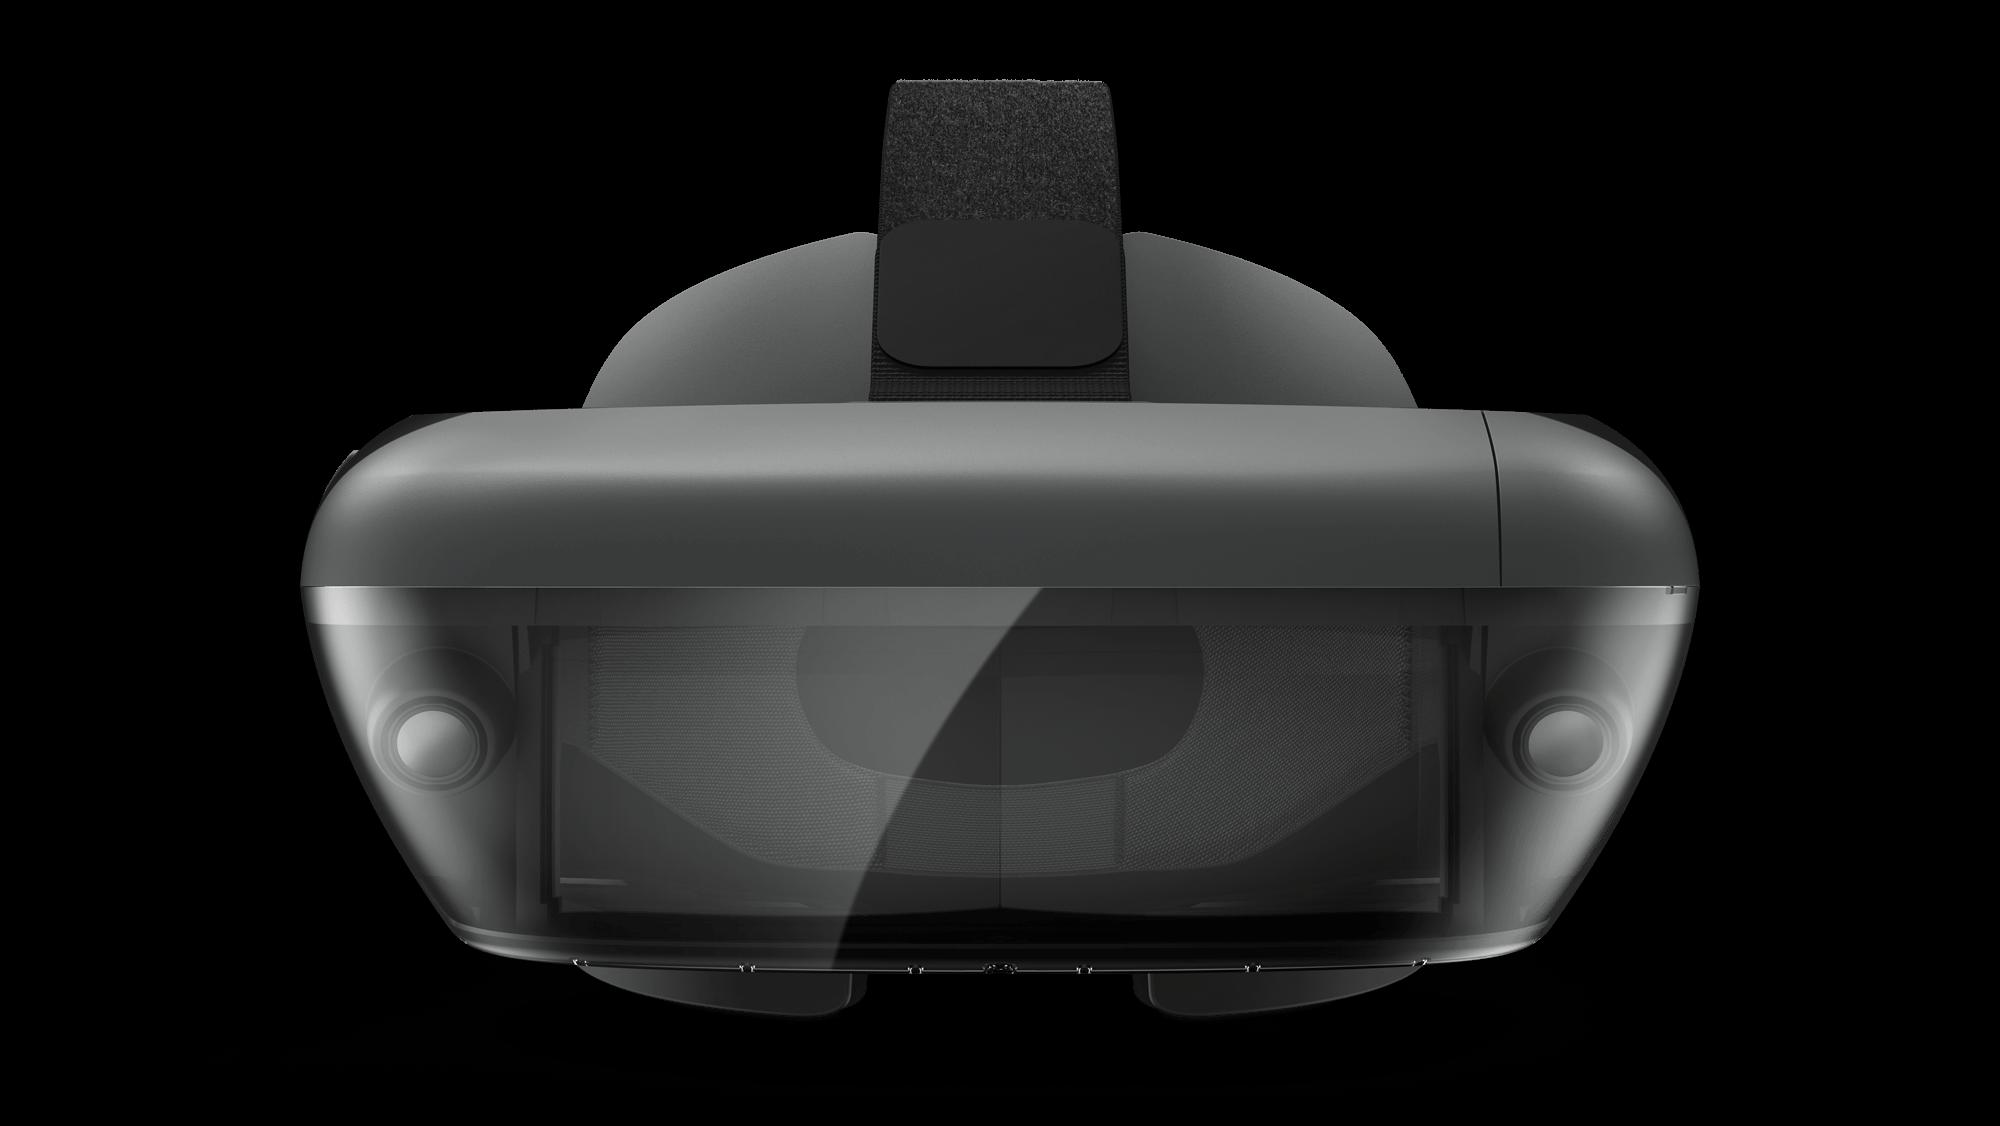 Mirage Headset Tour Front Forward Facing